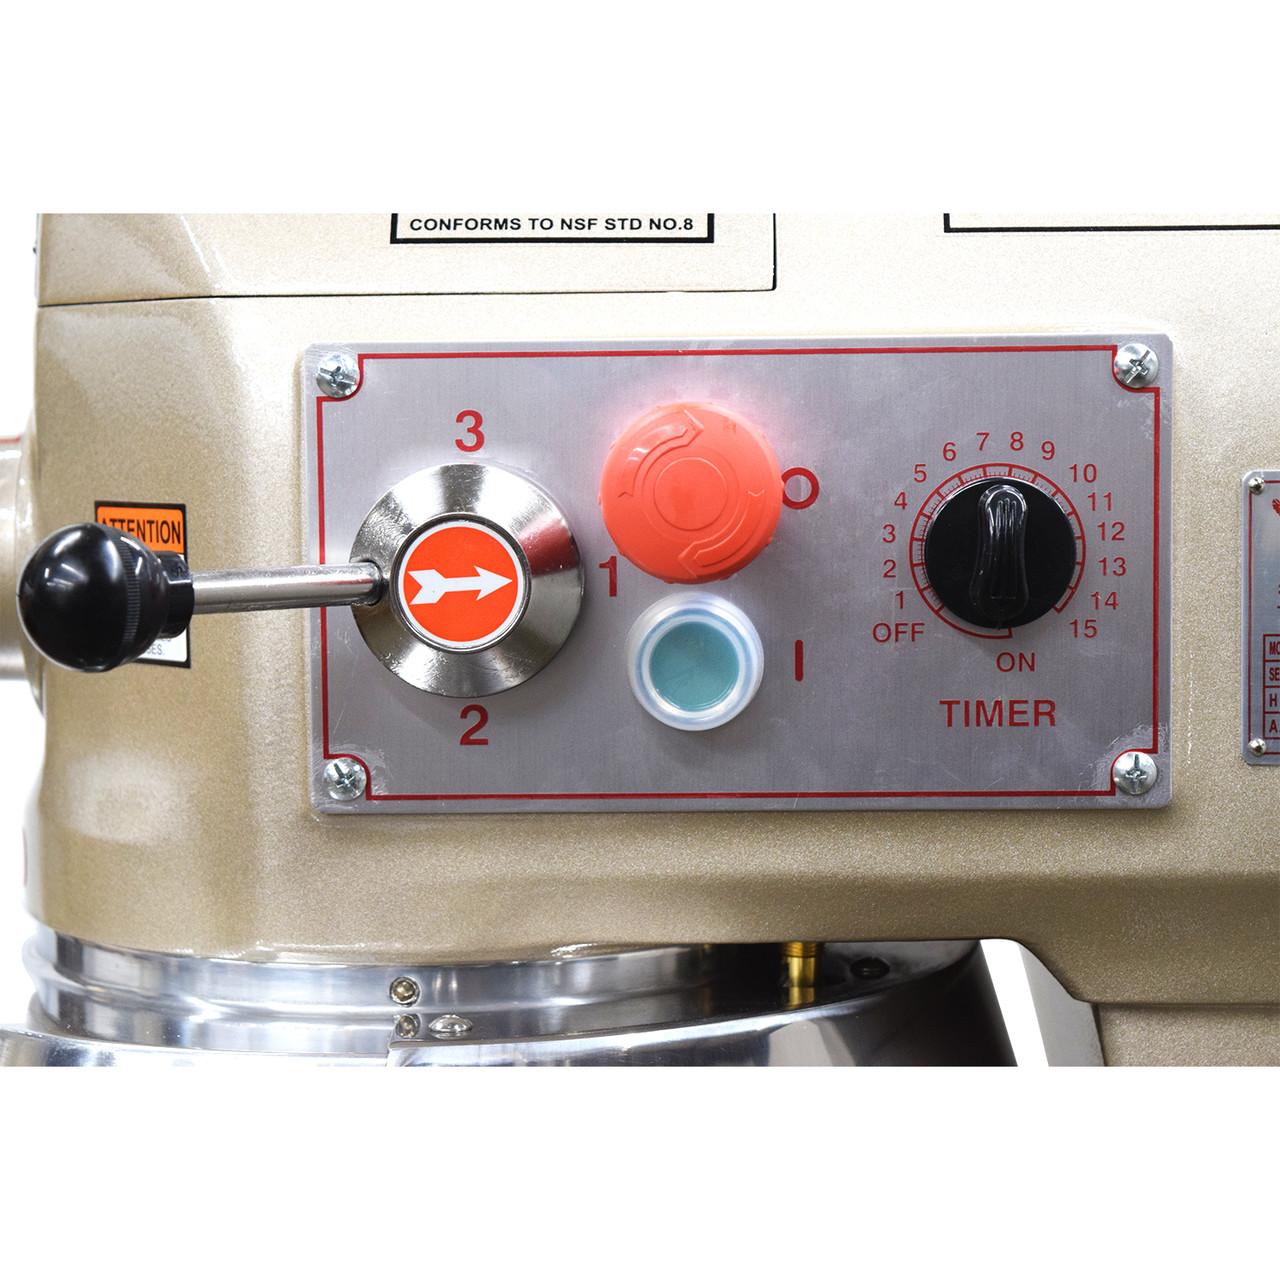 AE-30GA 30 Quart Commercial Planetary Mixer Standard Analog Timer